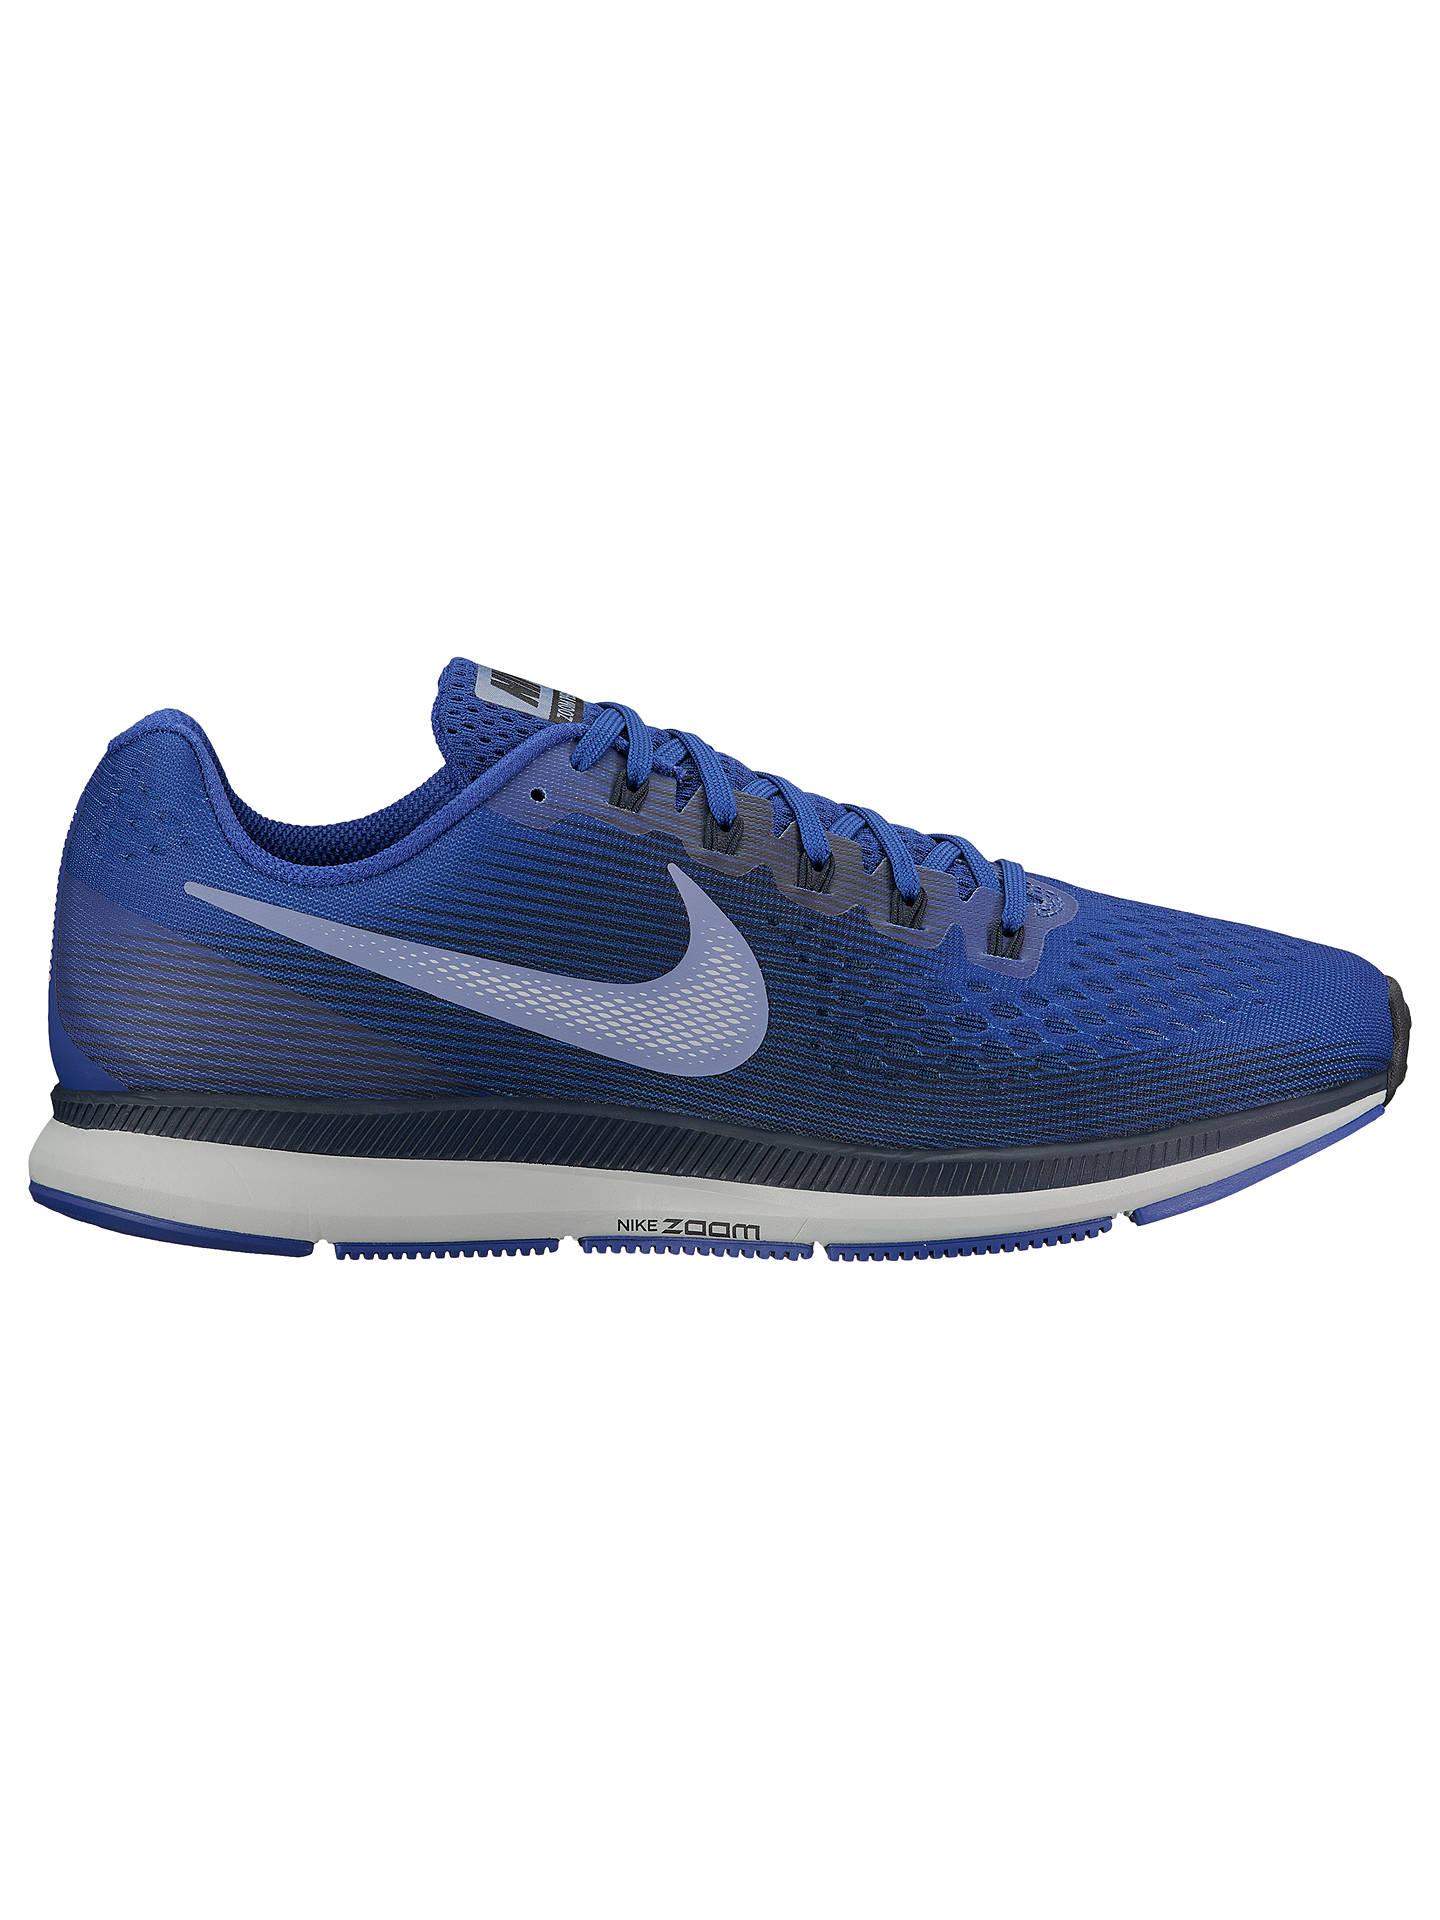 95386904cf7 Nike Air Zoom Pegasus 34 Men s Running Shoes at John Lewis   Partners